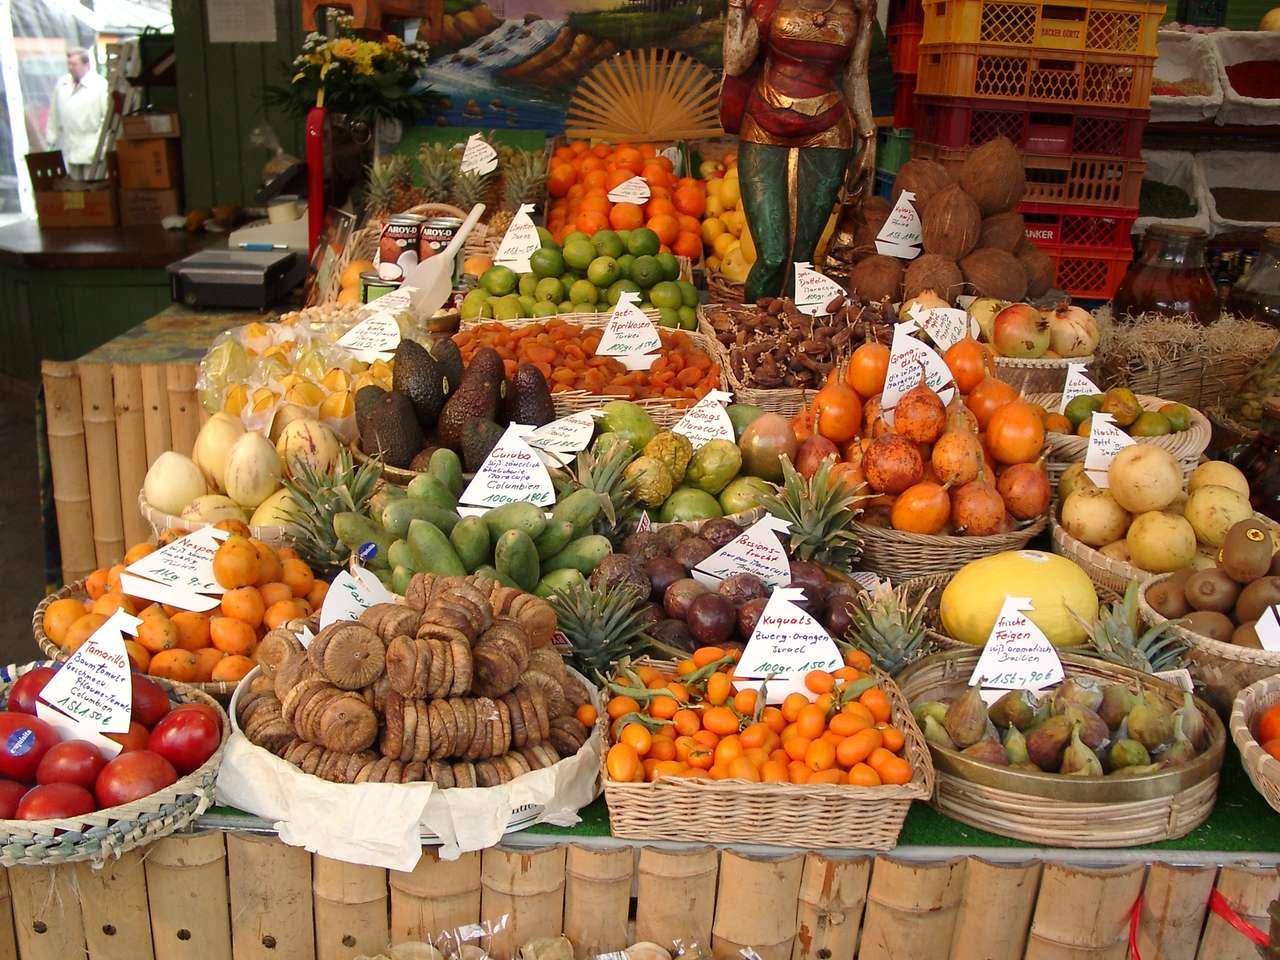 Stand cu fructe - Stand de fructe de pe München Viktualienmarkt (12×9)